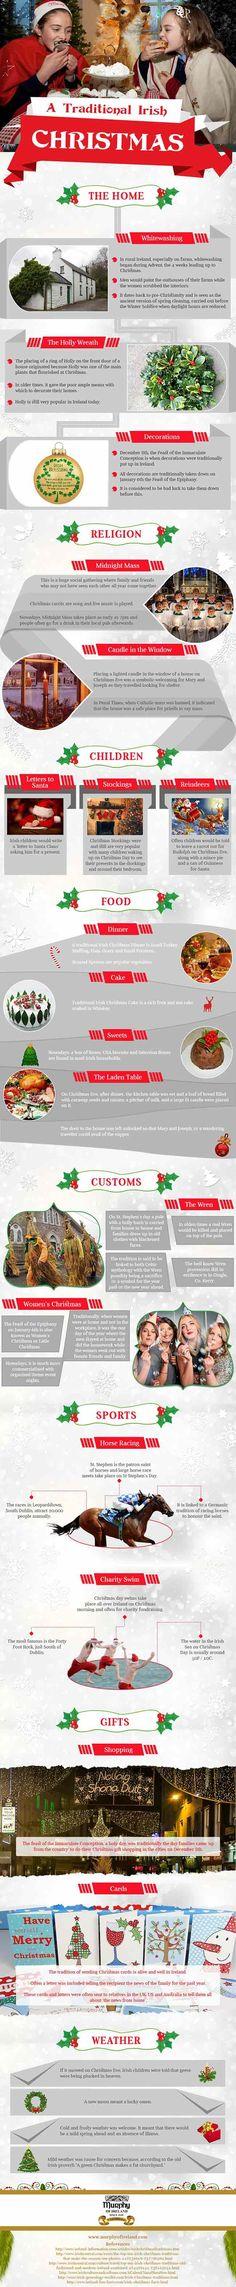 NOLLAIG - an Irish Christmas. The ultimate guide to a traditional Irish Christmas (PHOTO) - IrishCentral.com